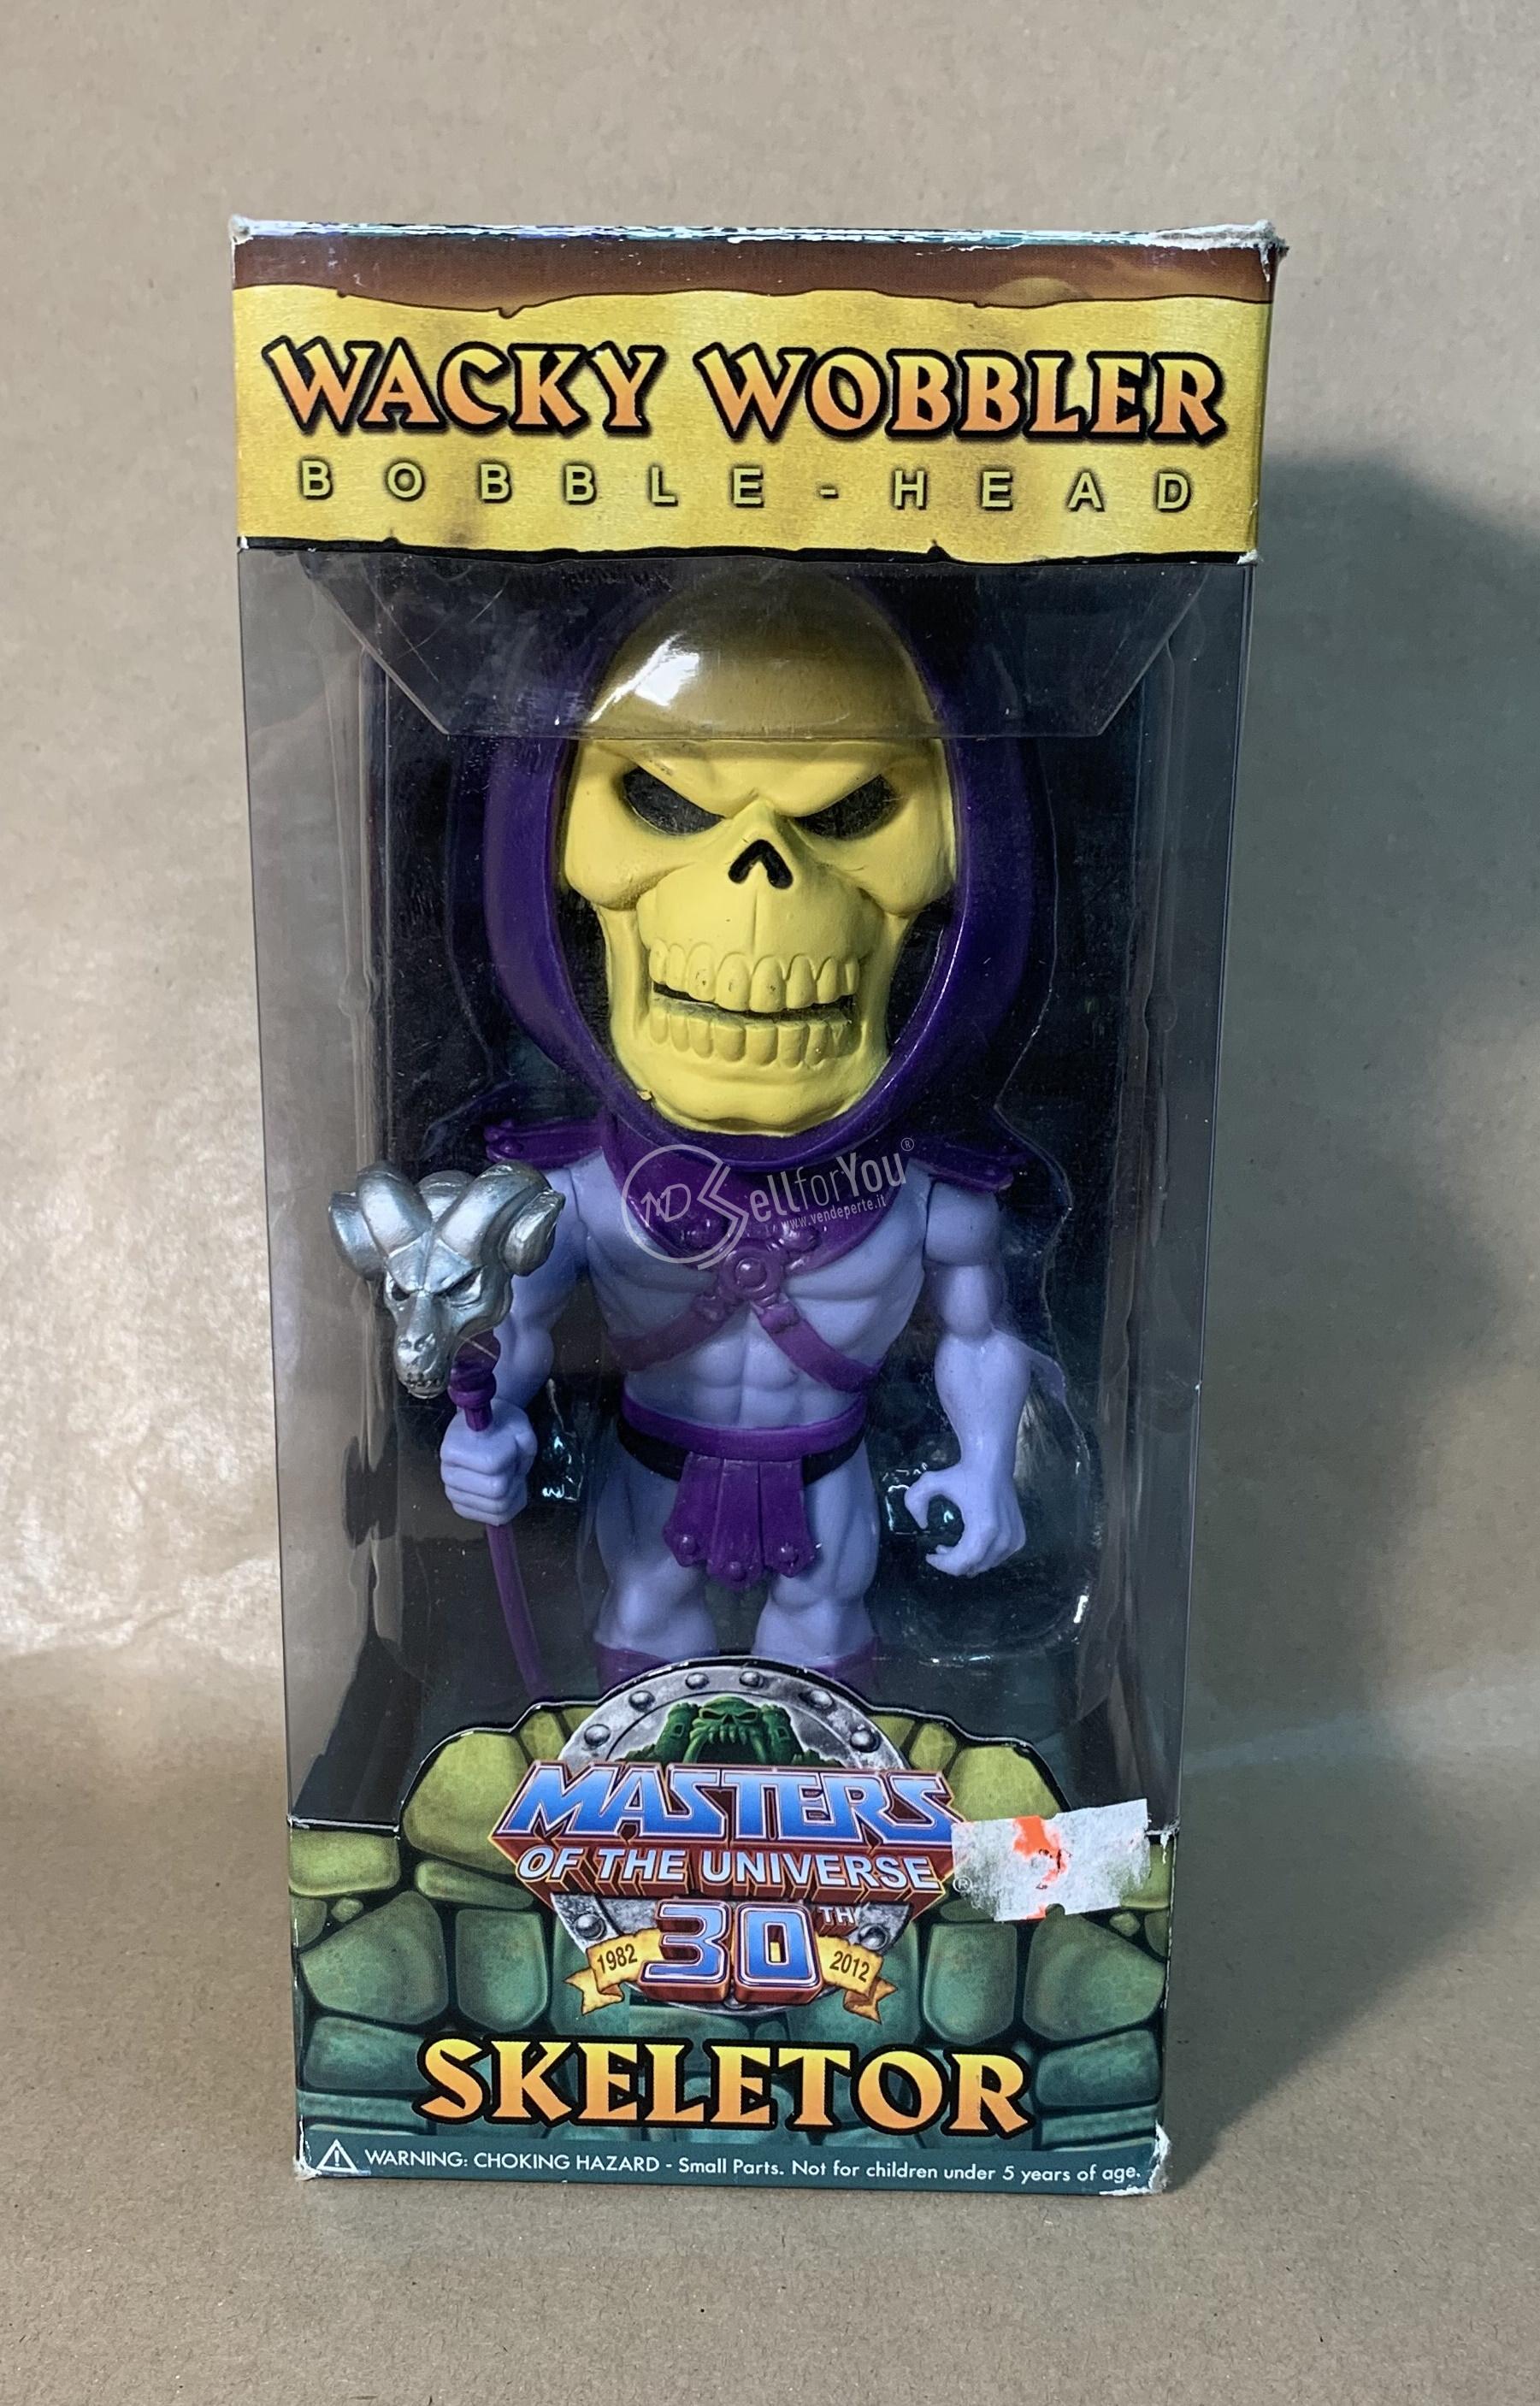 Masters of the Universe Skeletor Wacky Wobbler 2012 sellforyou